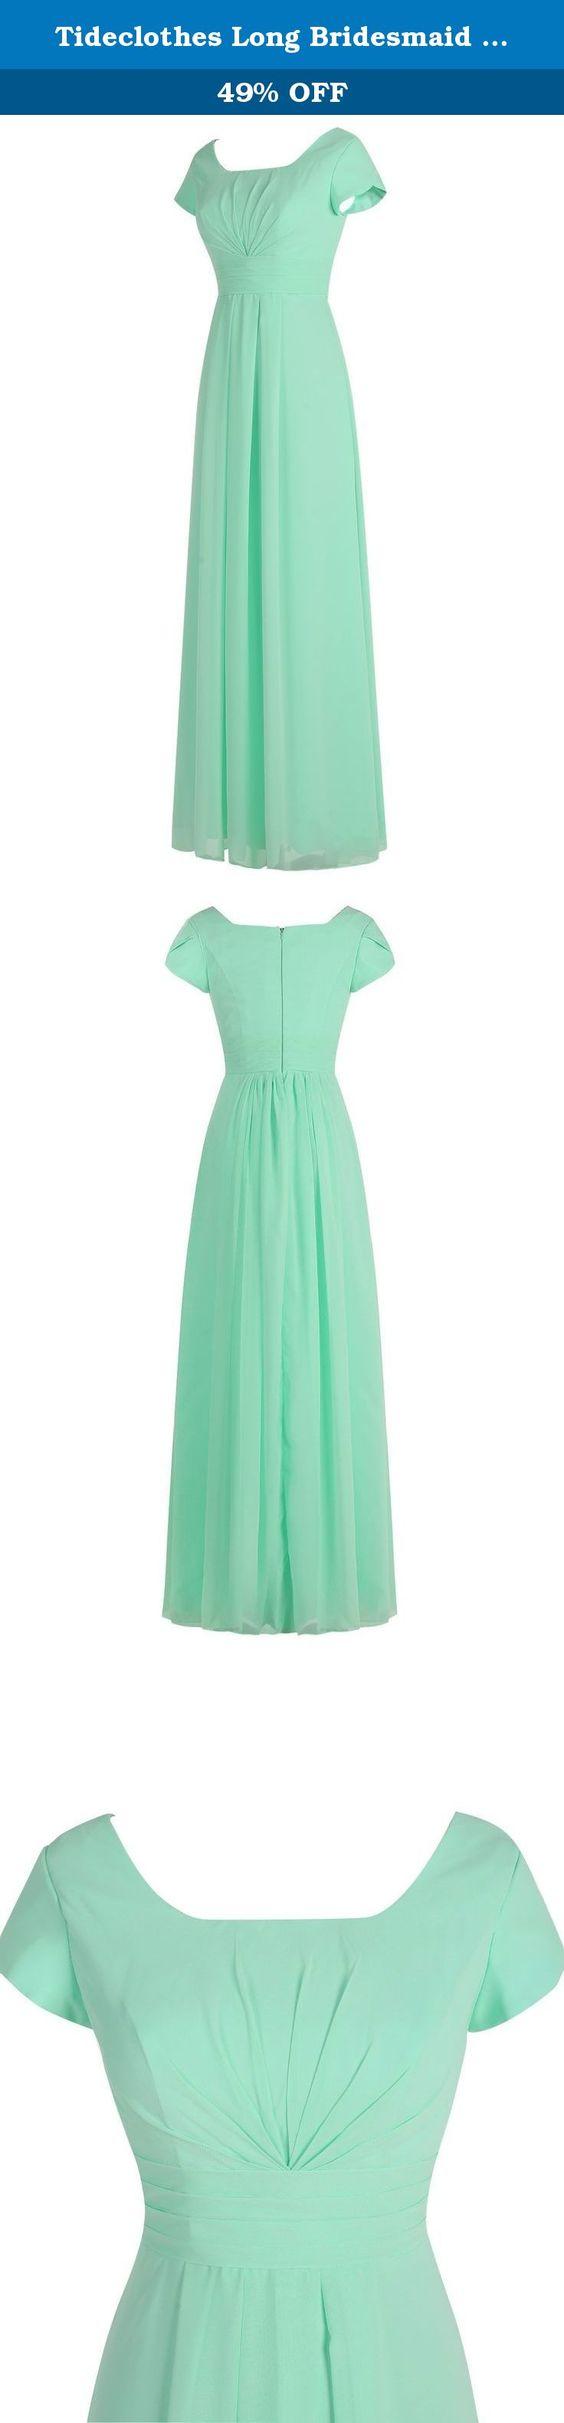 Tideclothes long bridesmaid dress chiffon prom evening dress short